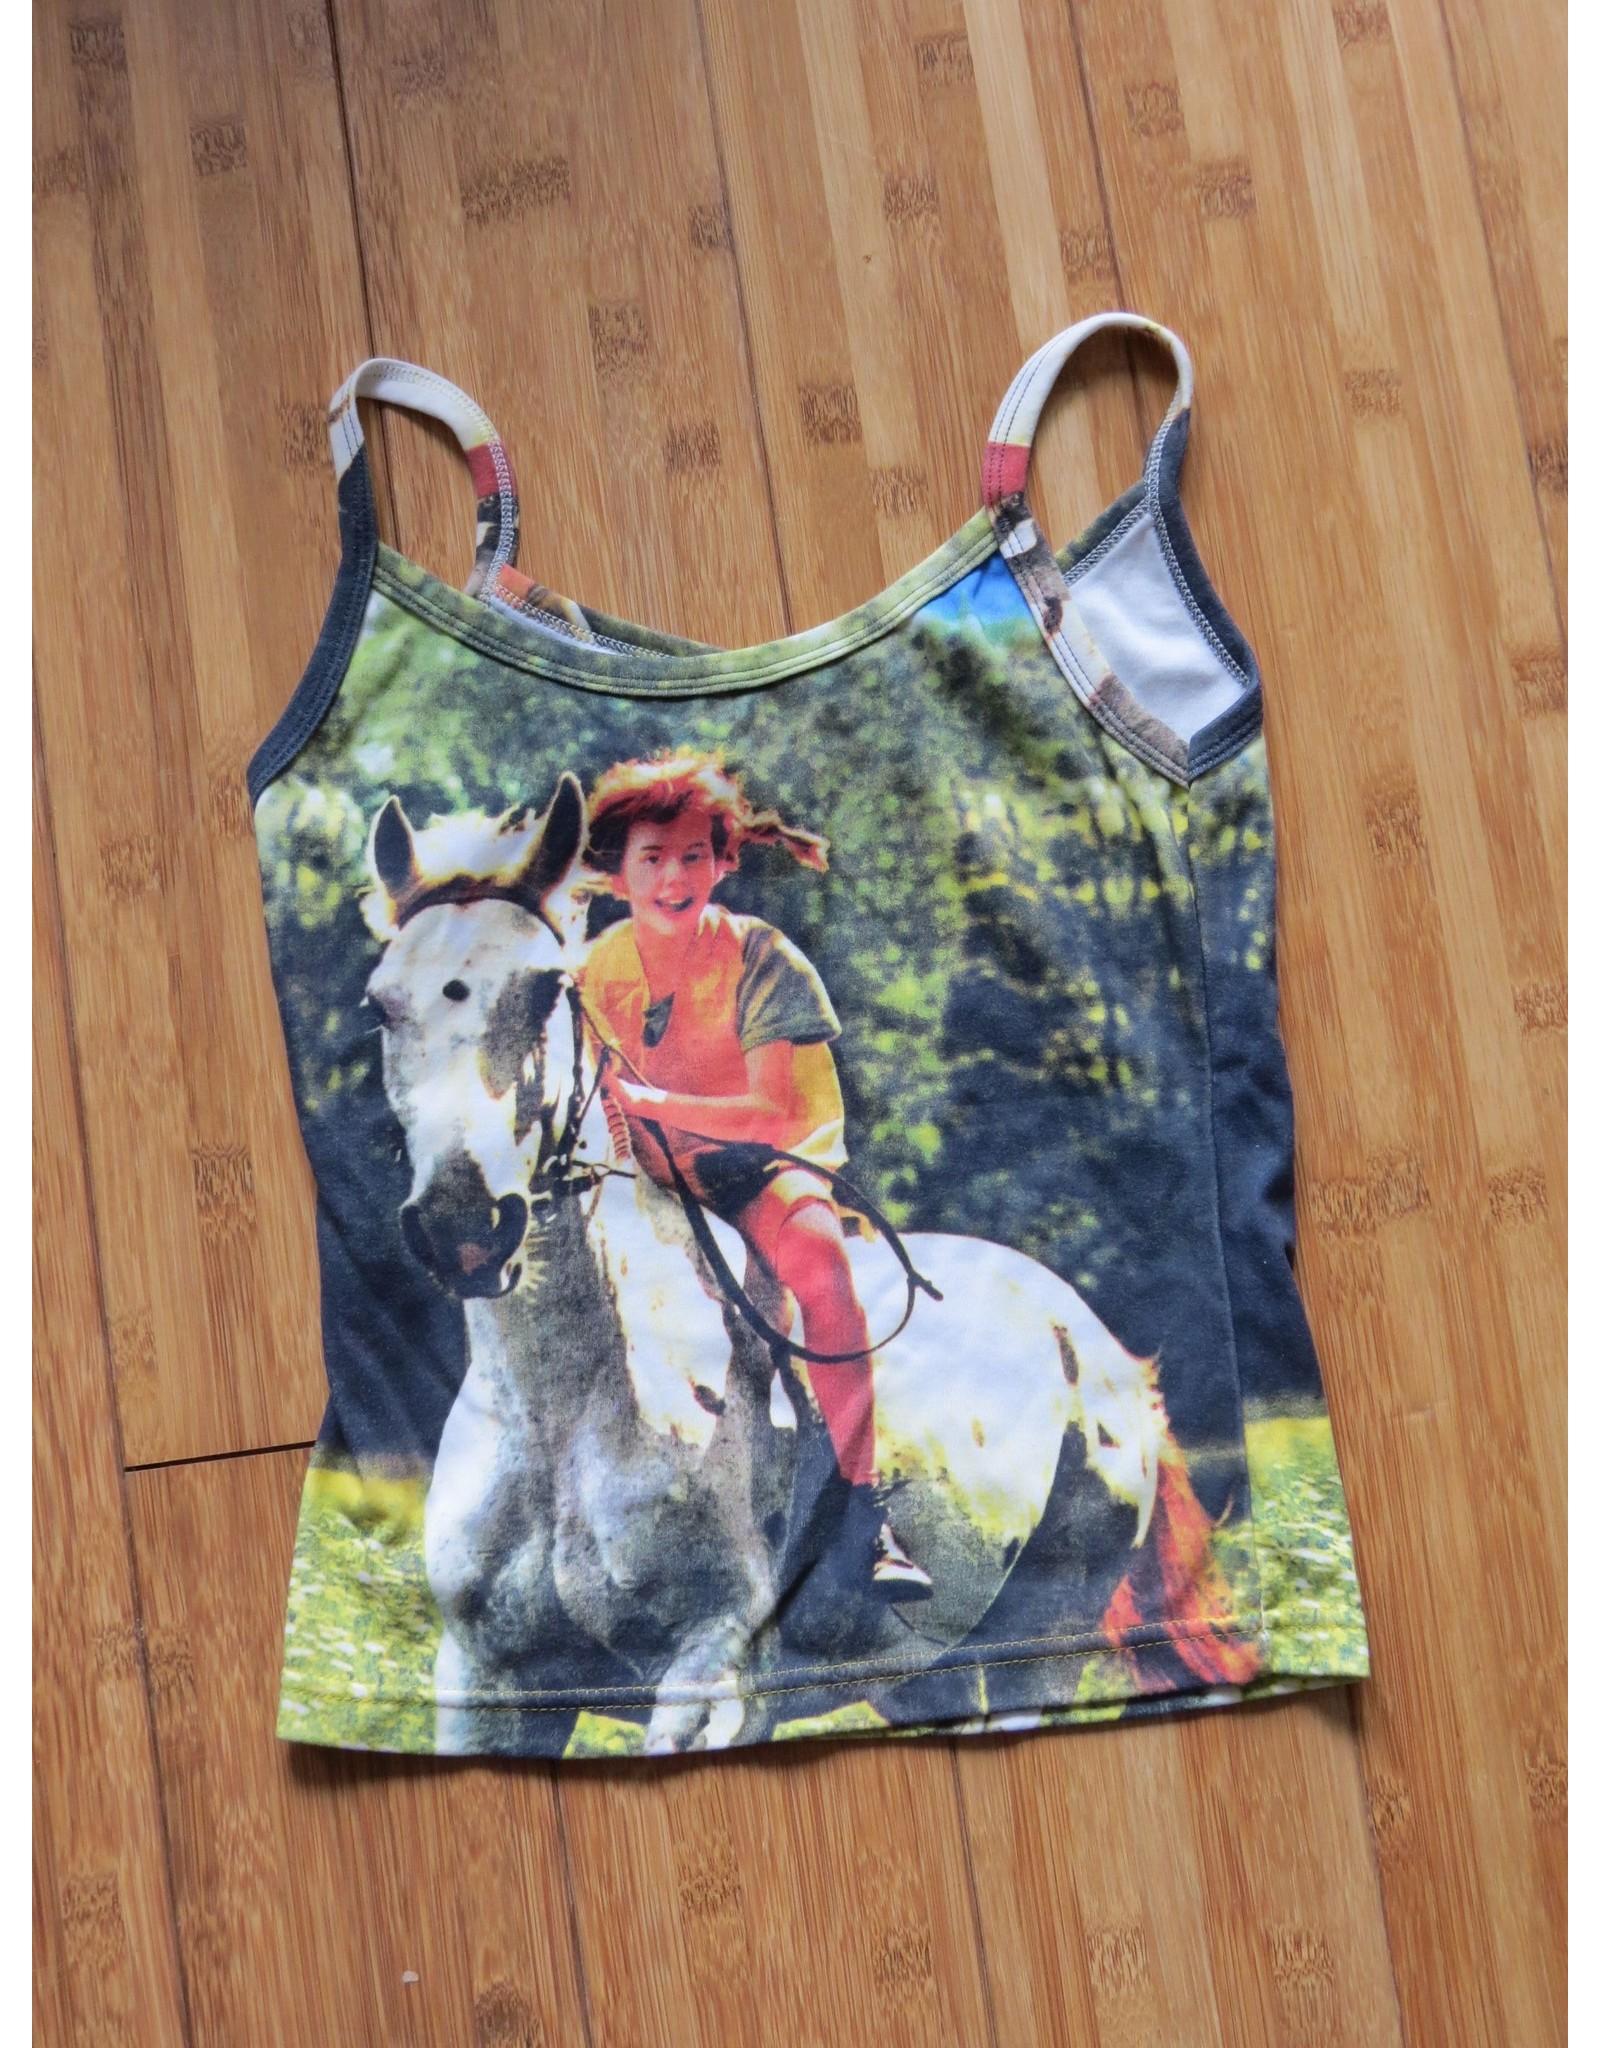 Pippi Langkous Adult tshirt - Pippi and horse